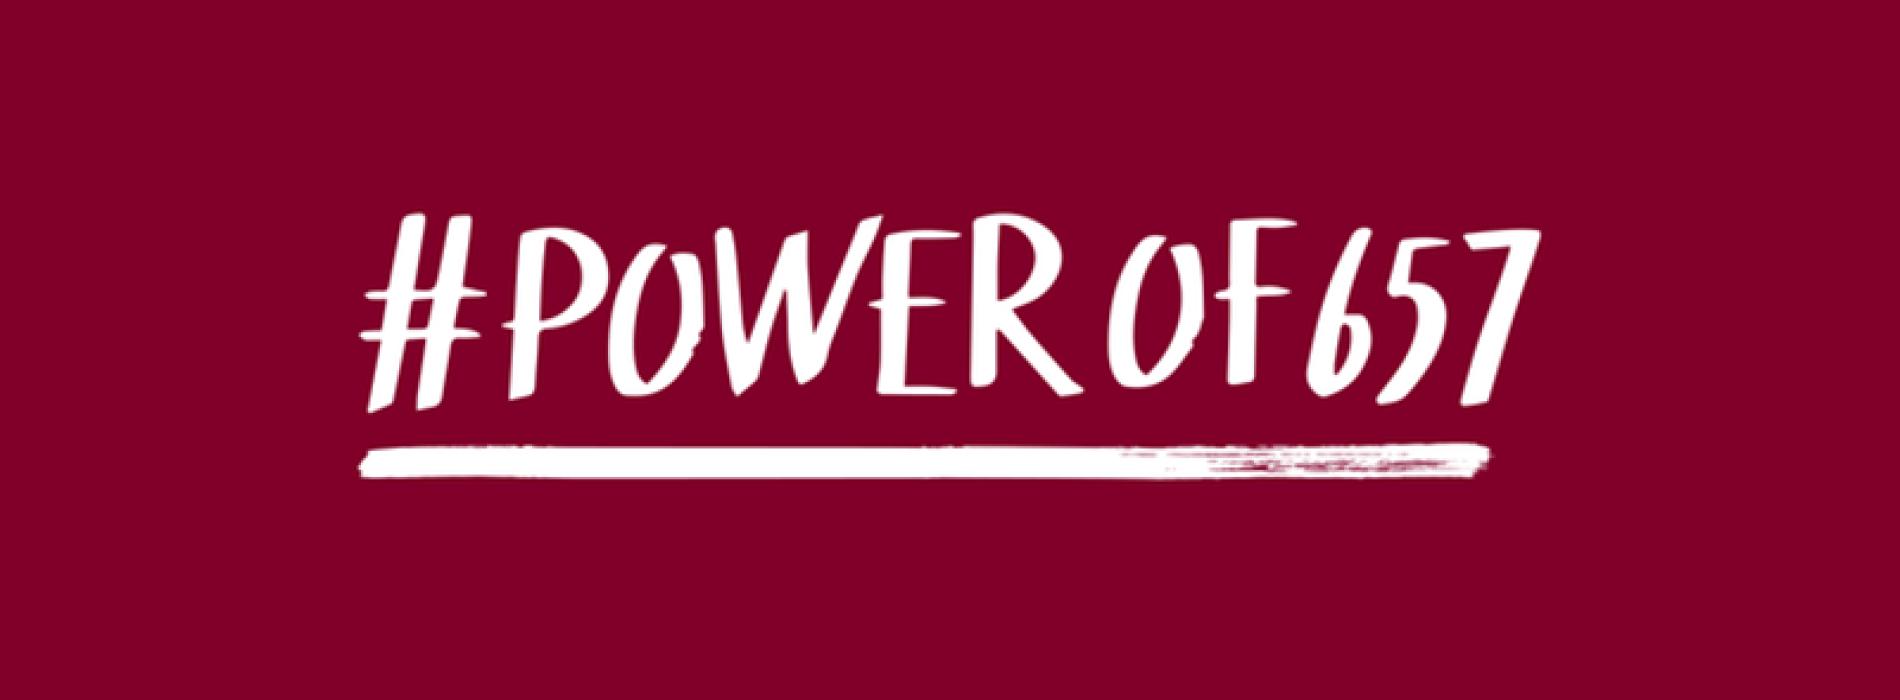 #powerof657 campaign